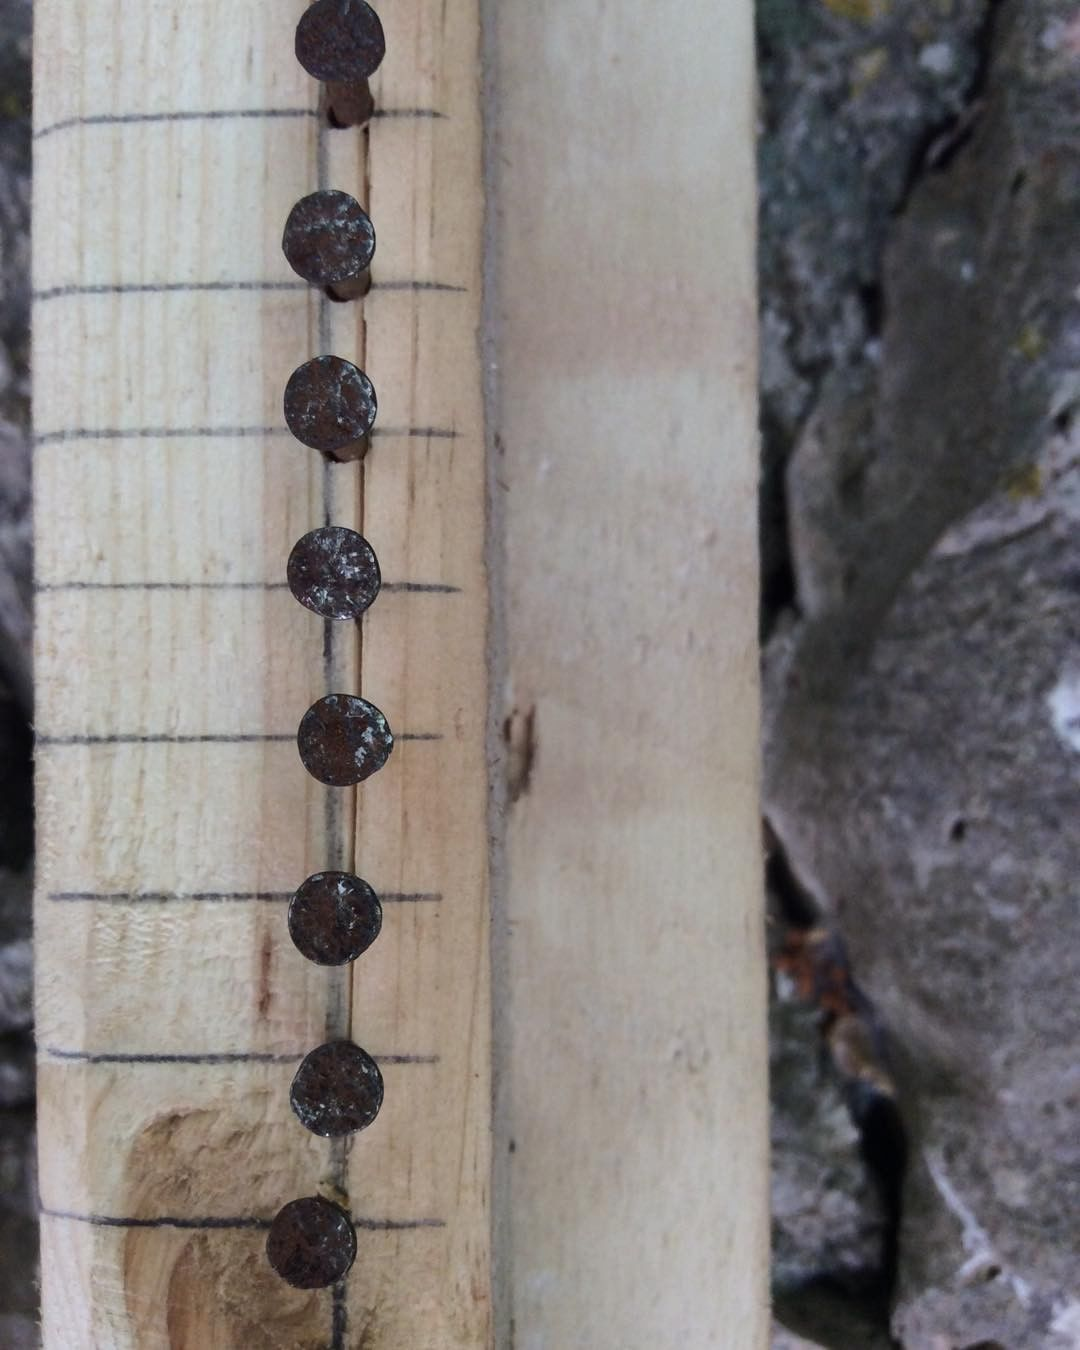 seabed-penelope-kouvara-fleves-project-tidal-flow--art-weaving-8